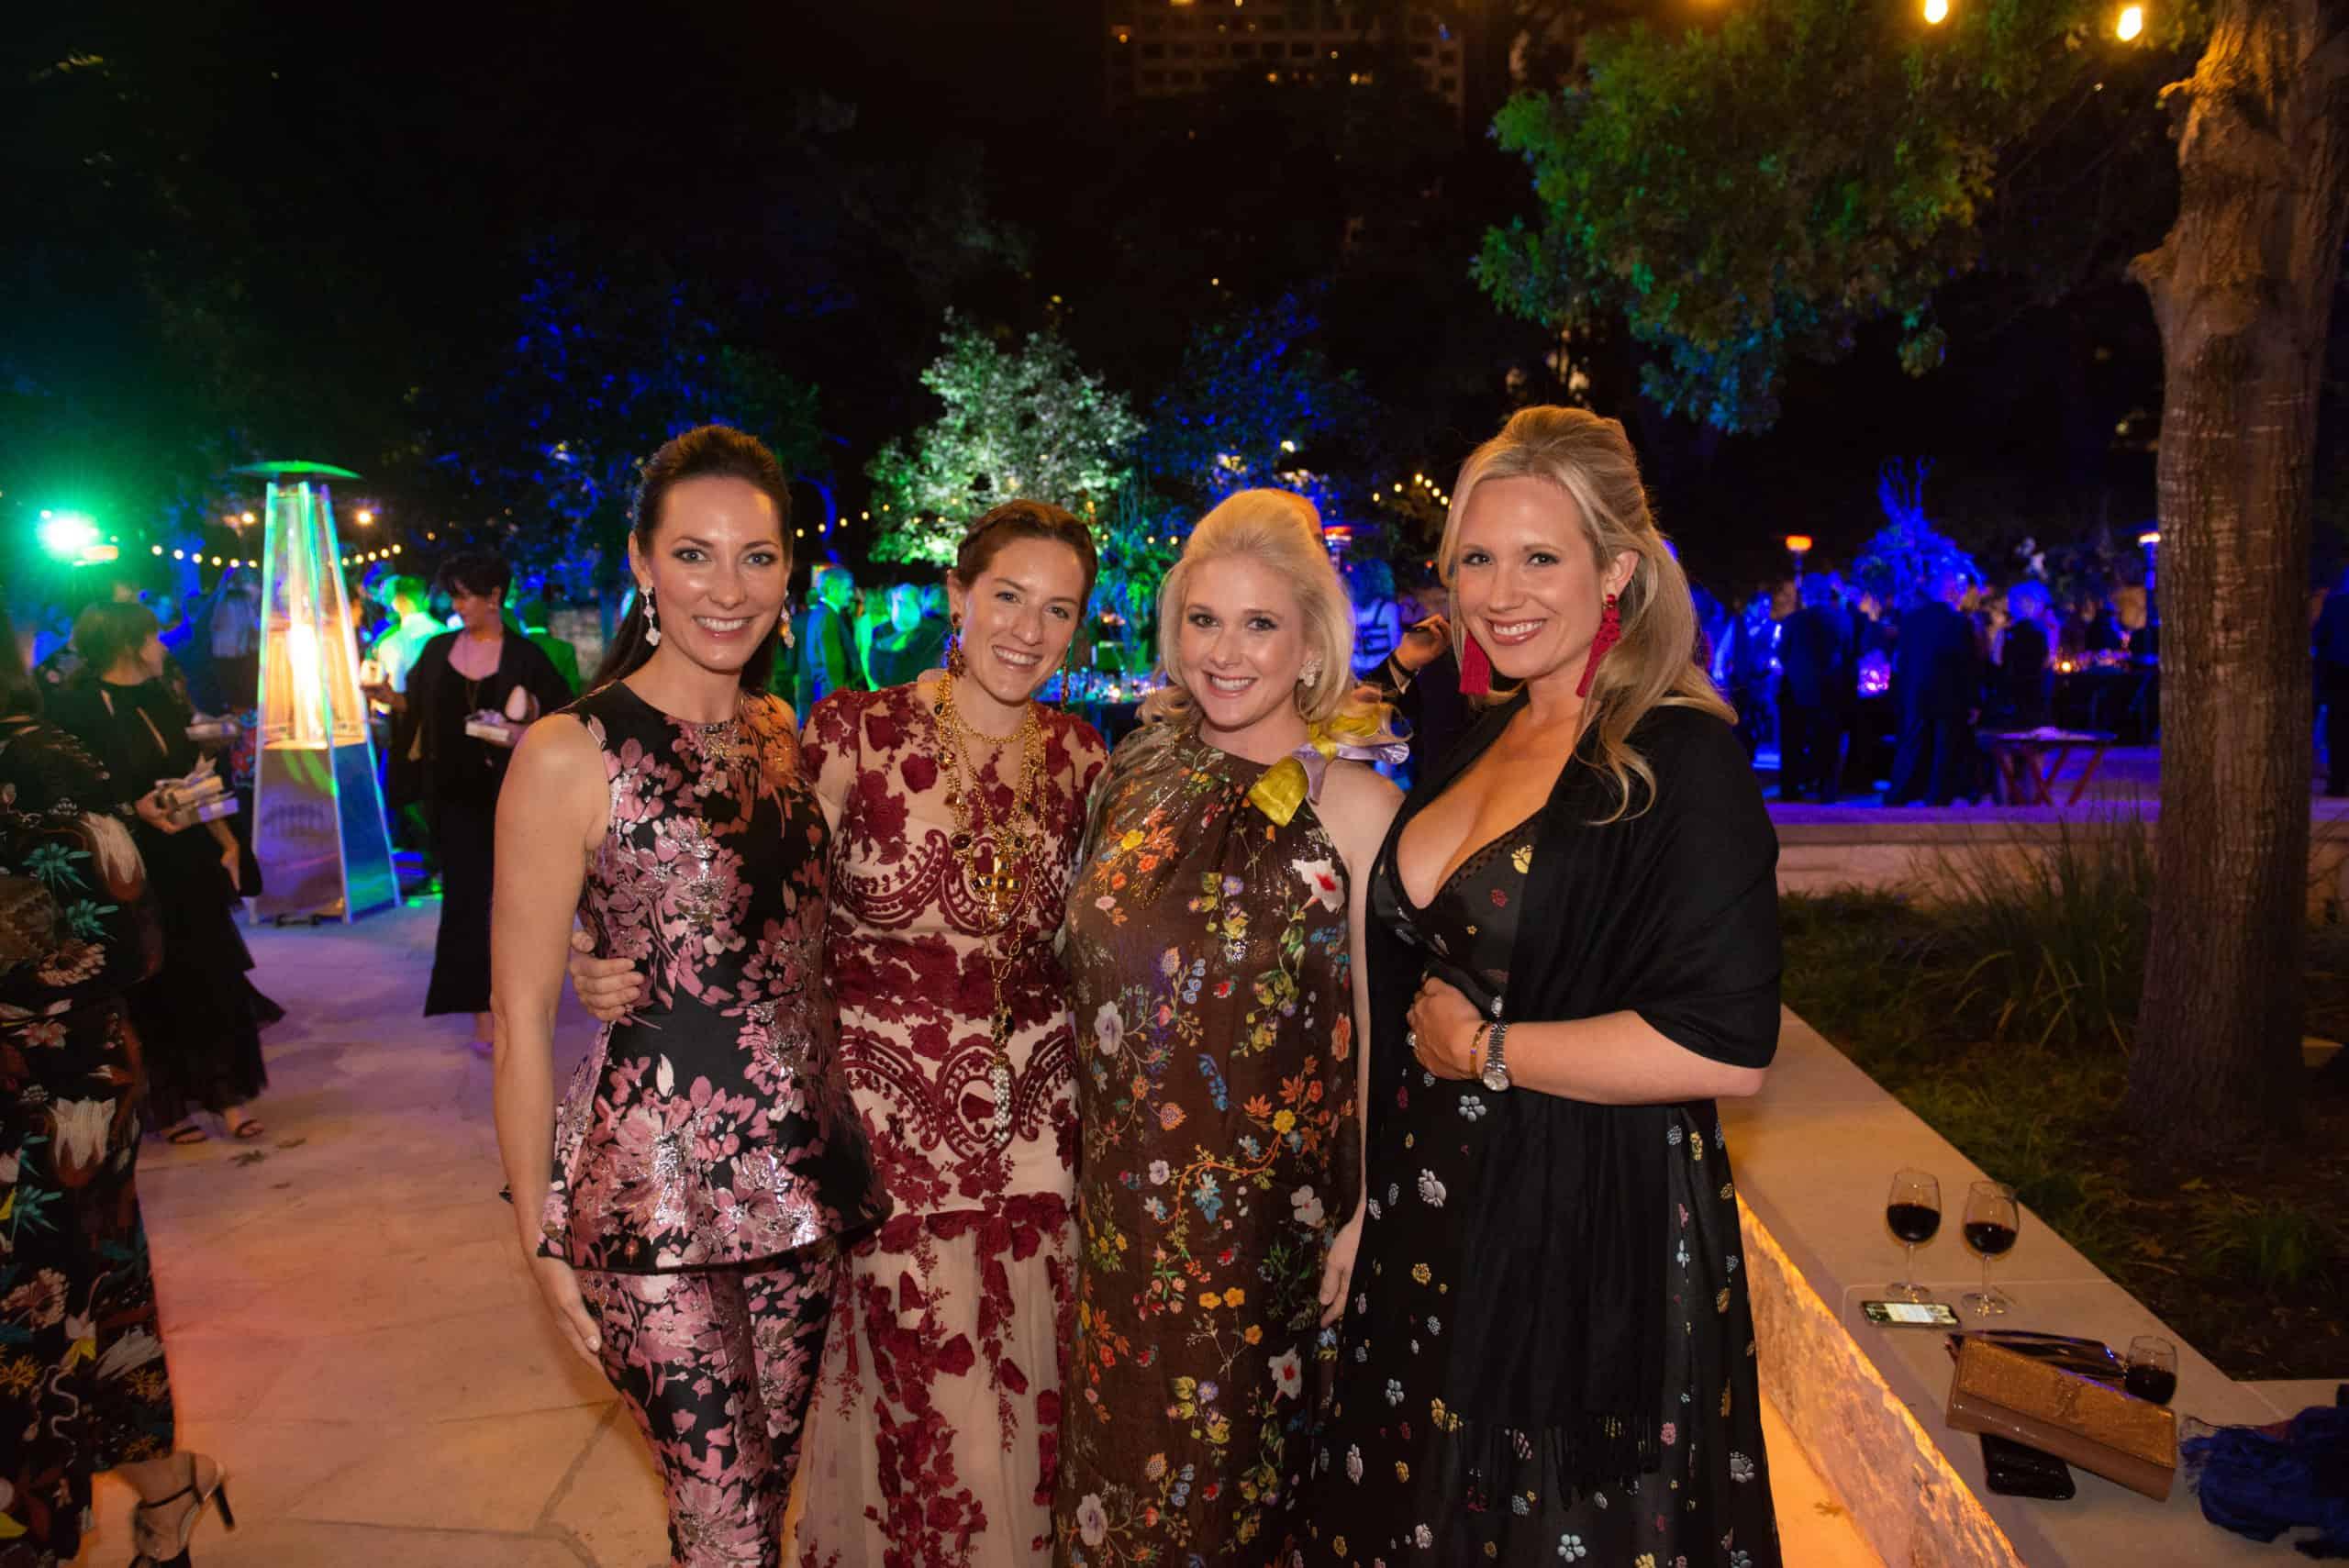 Corinna Richter, Mal Moorman, Christina Ketabchi and Ashley Friedman